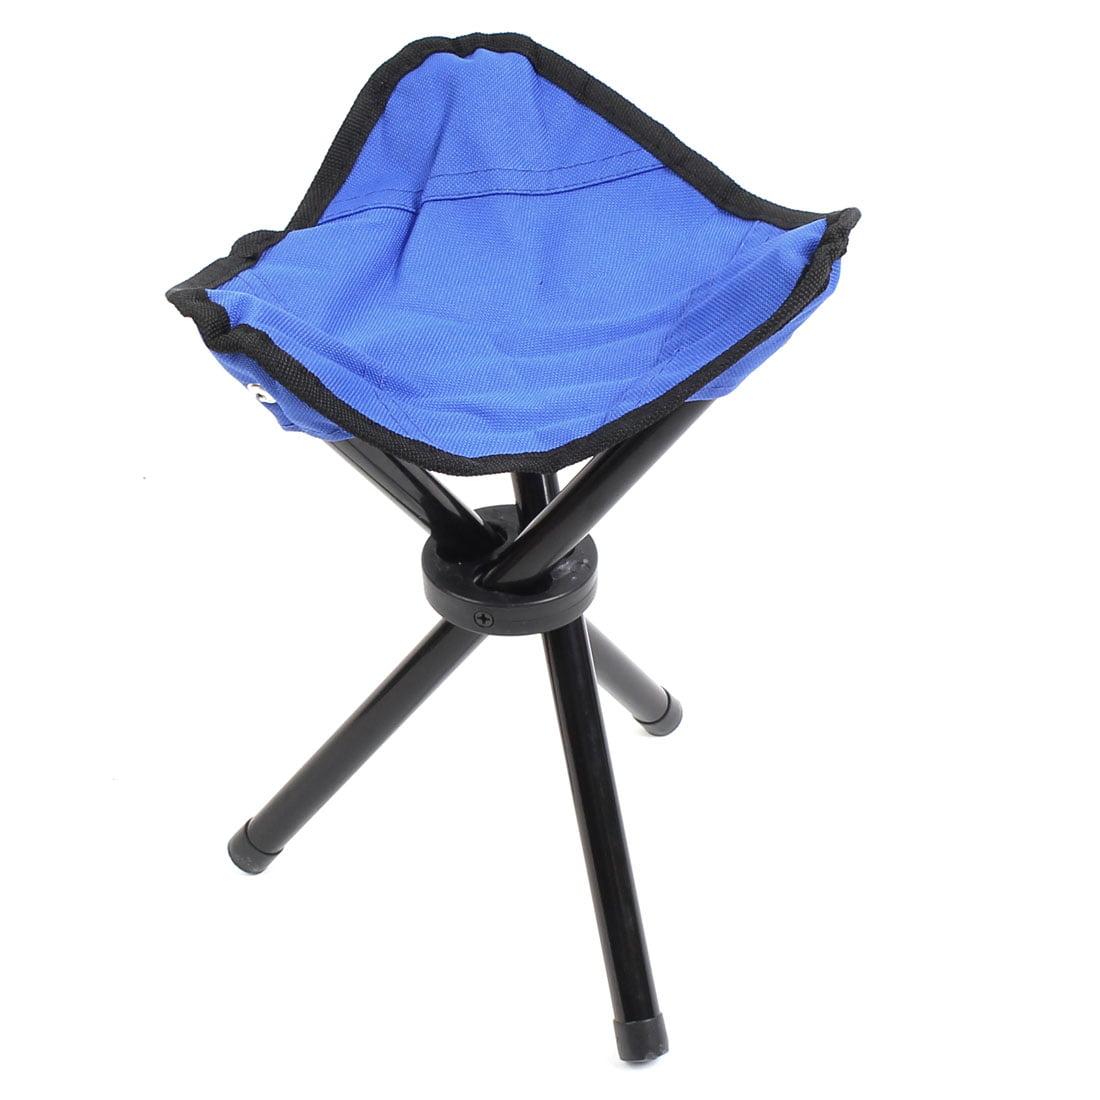 Fishing Home Metal Frame Nylon Seat Portable Folding